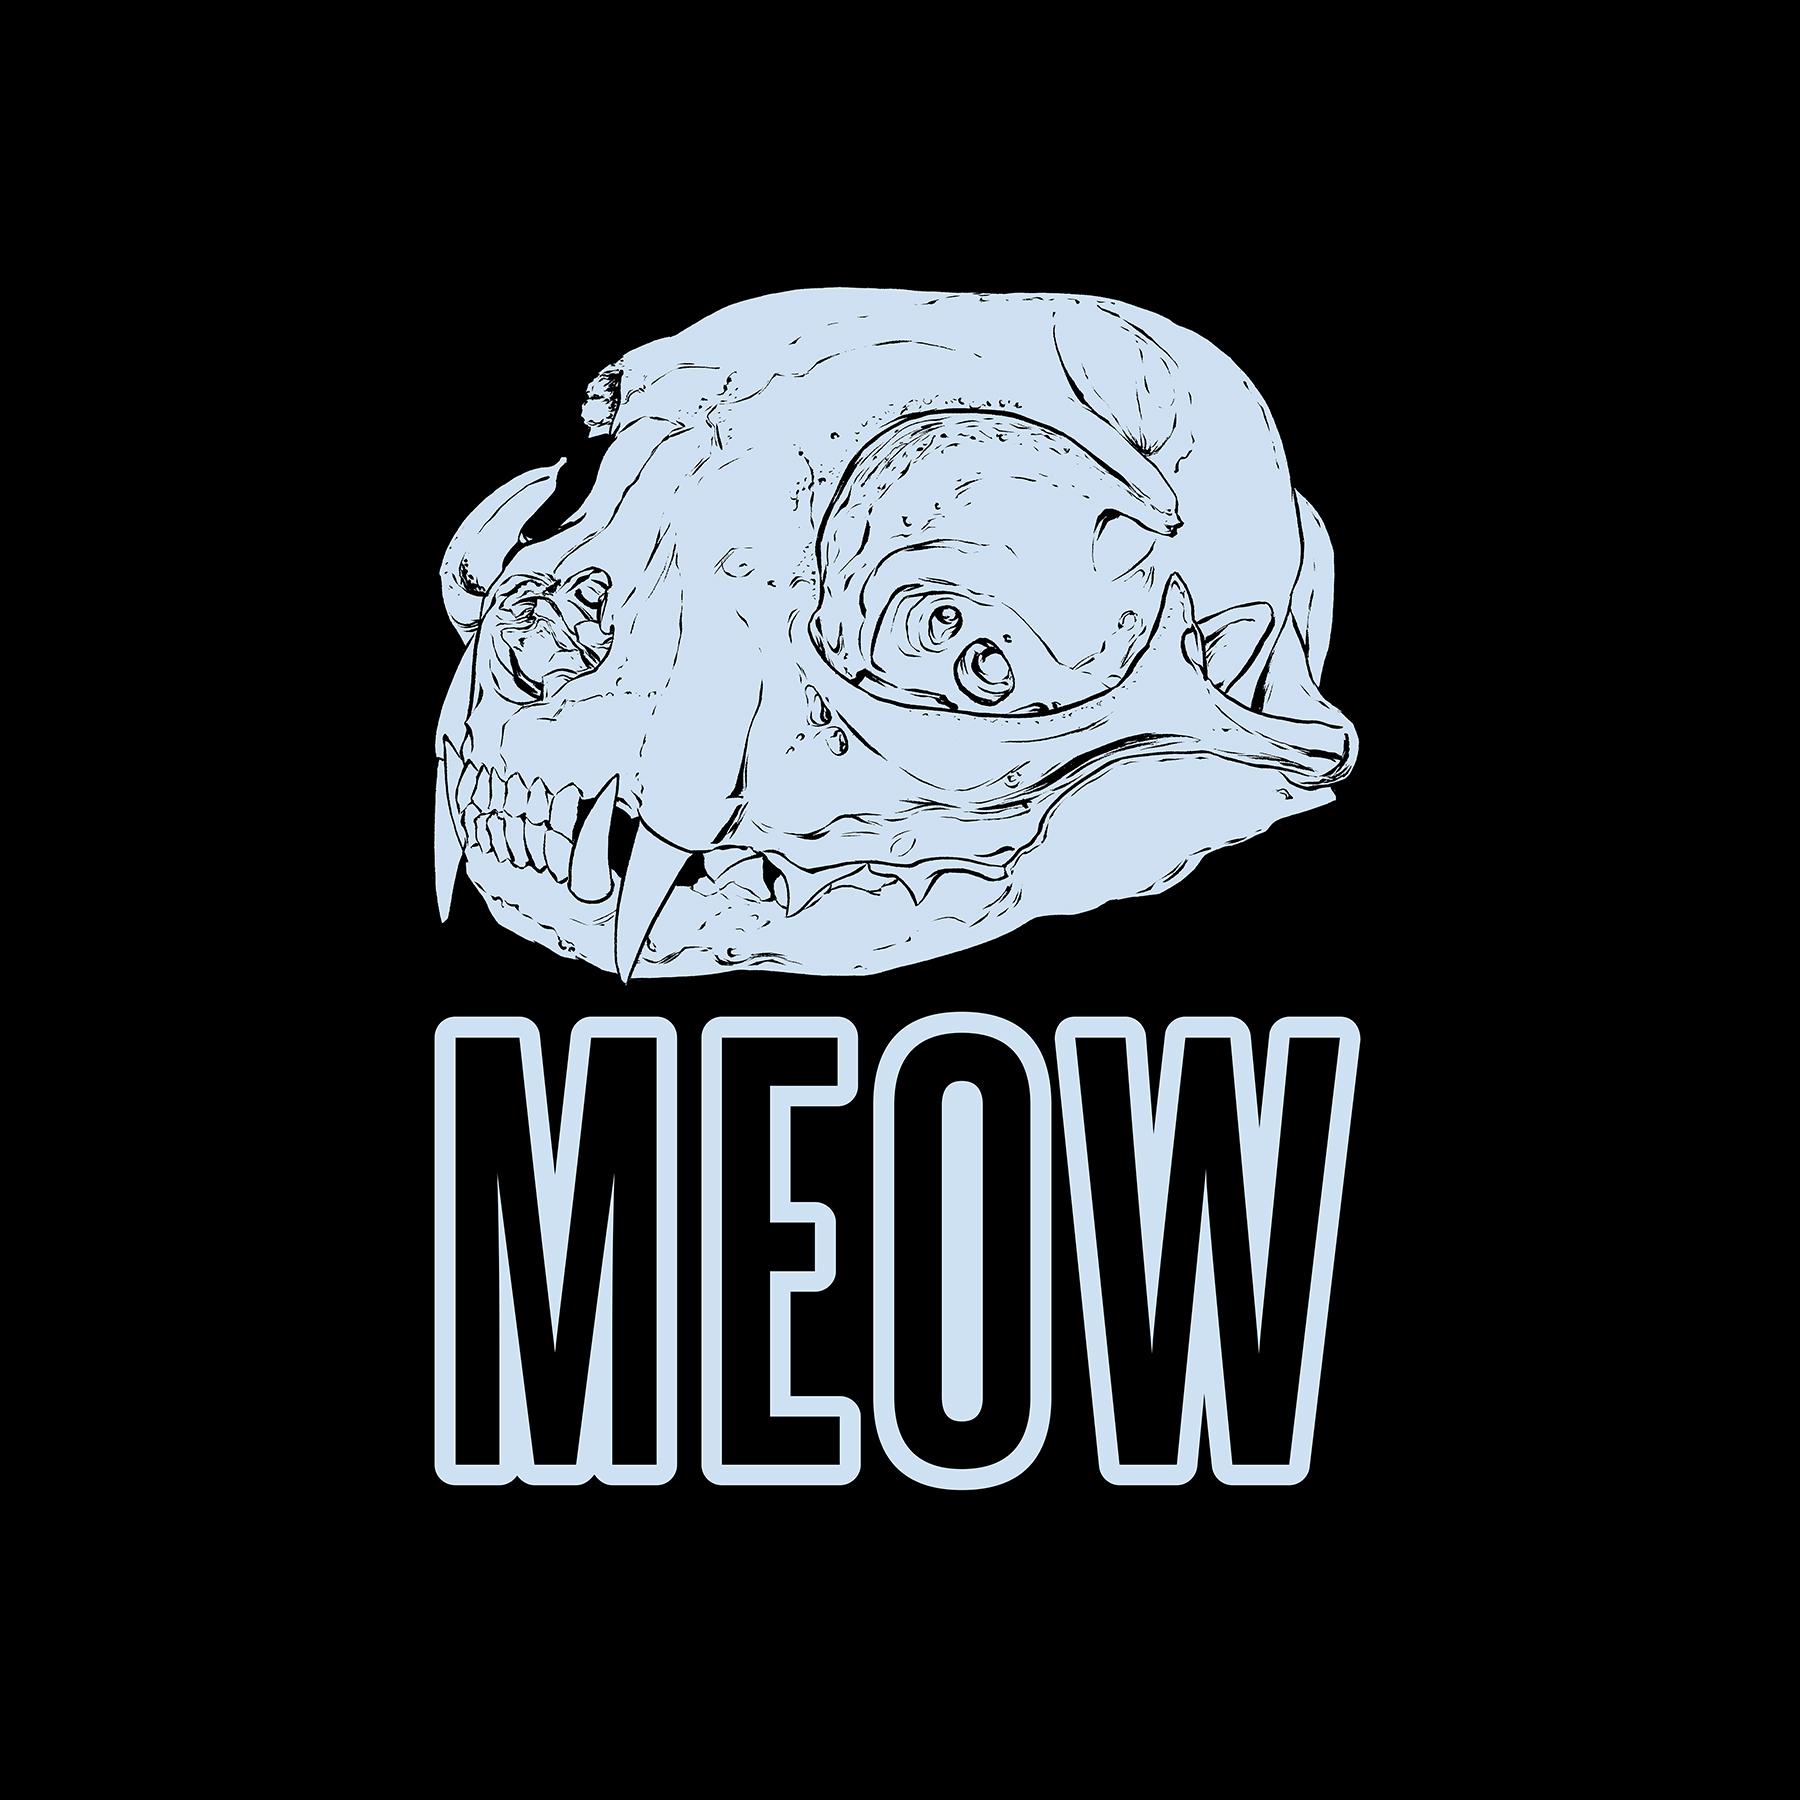 MeowTbasic.jpg